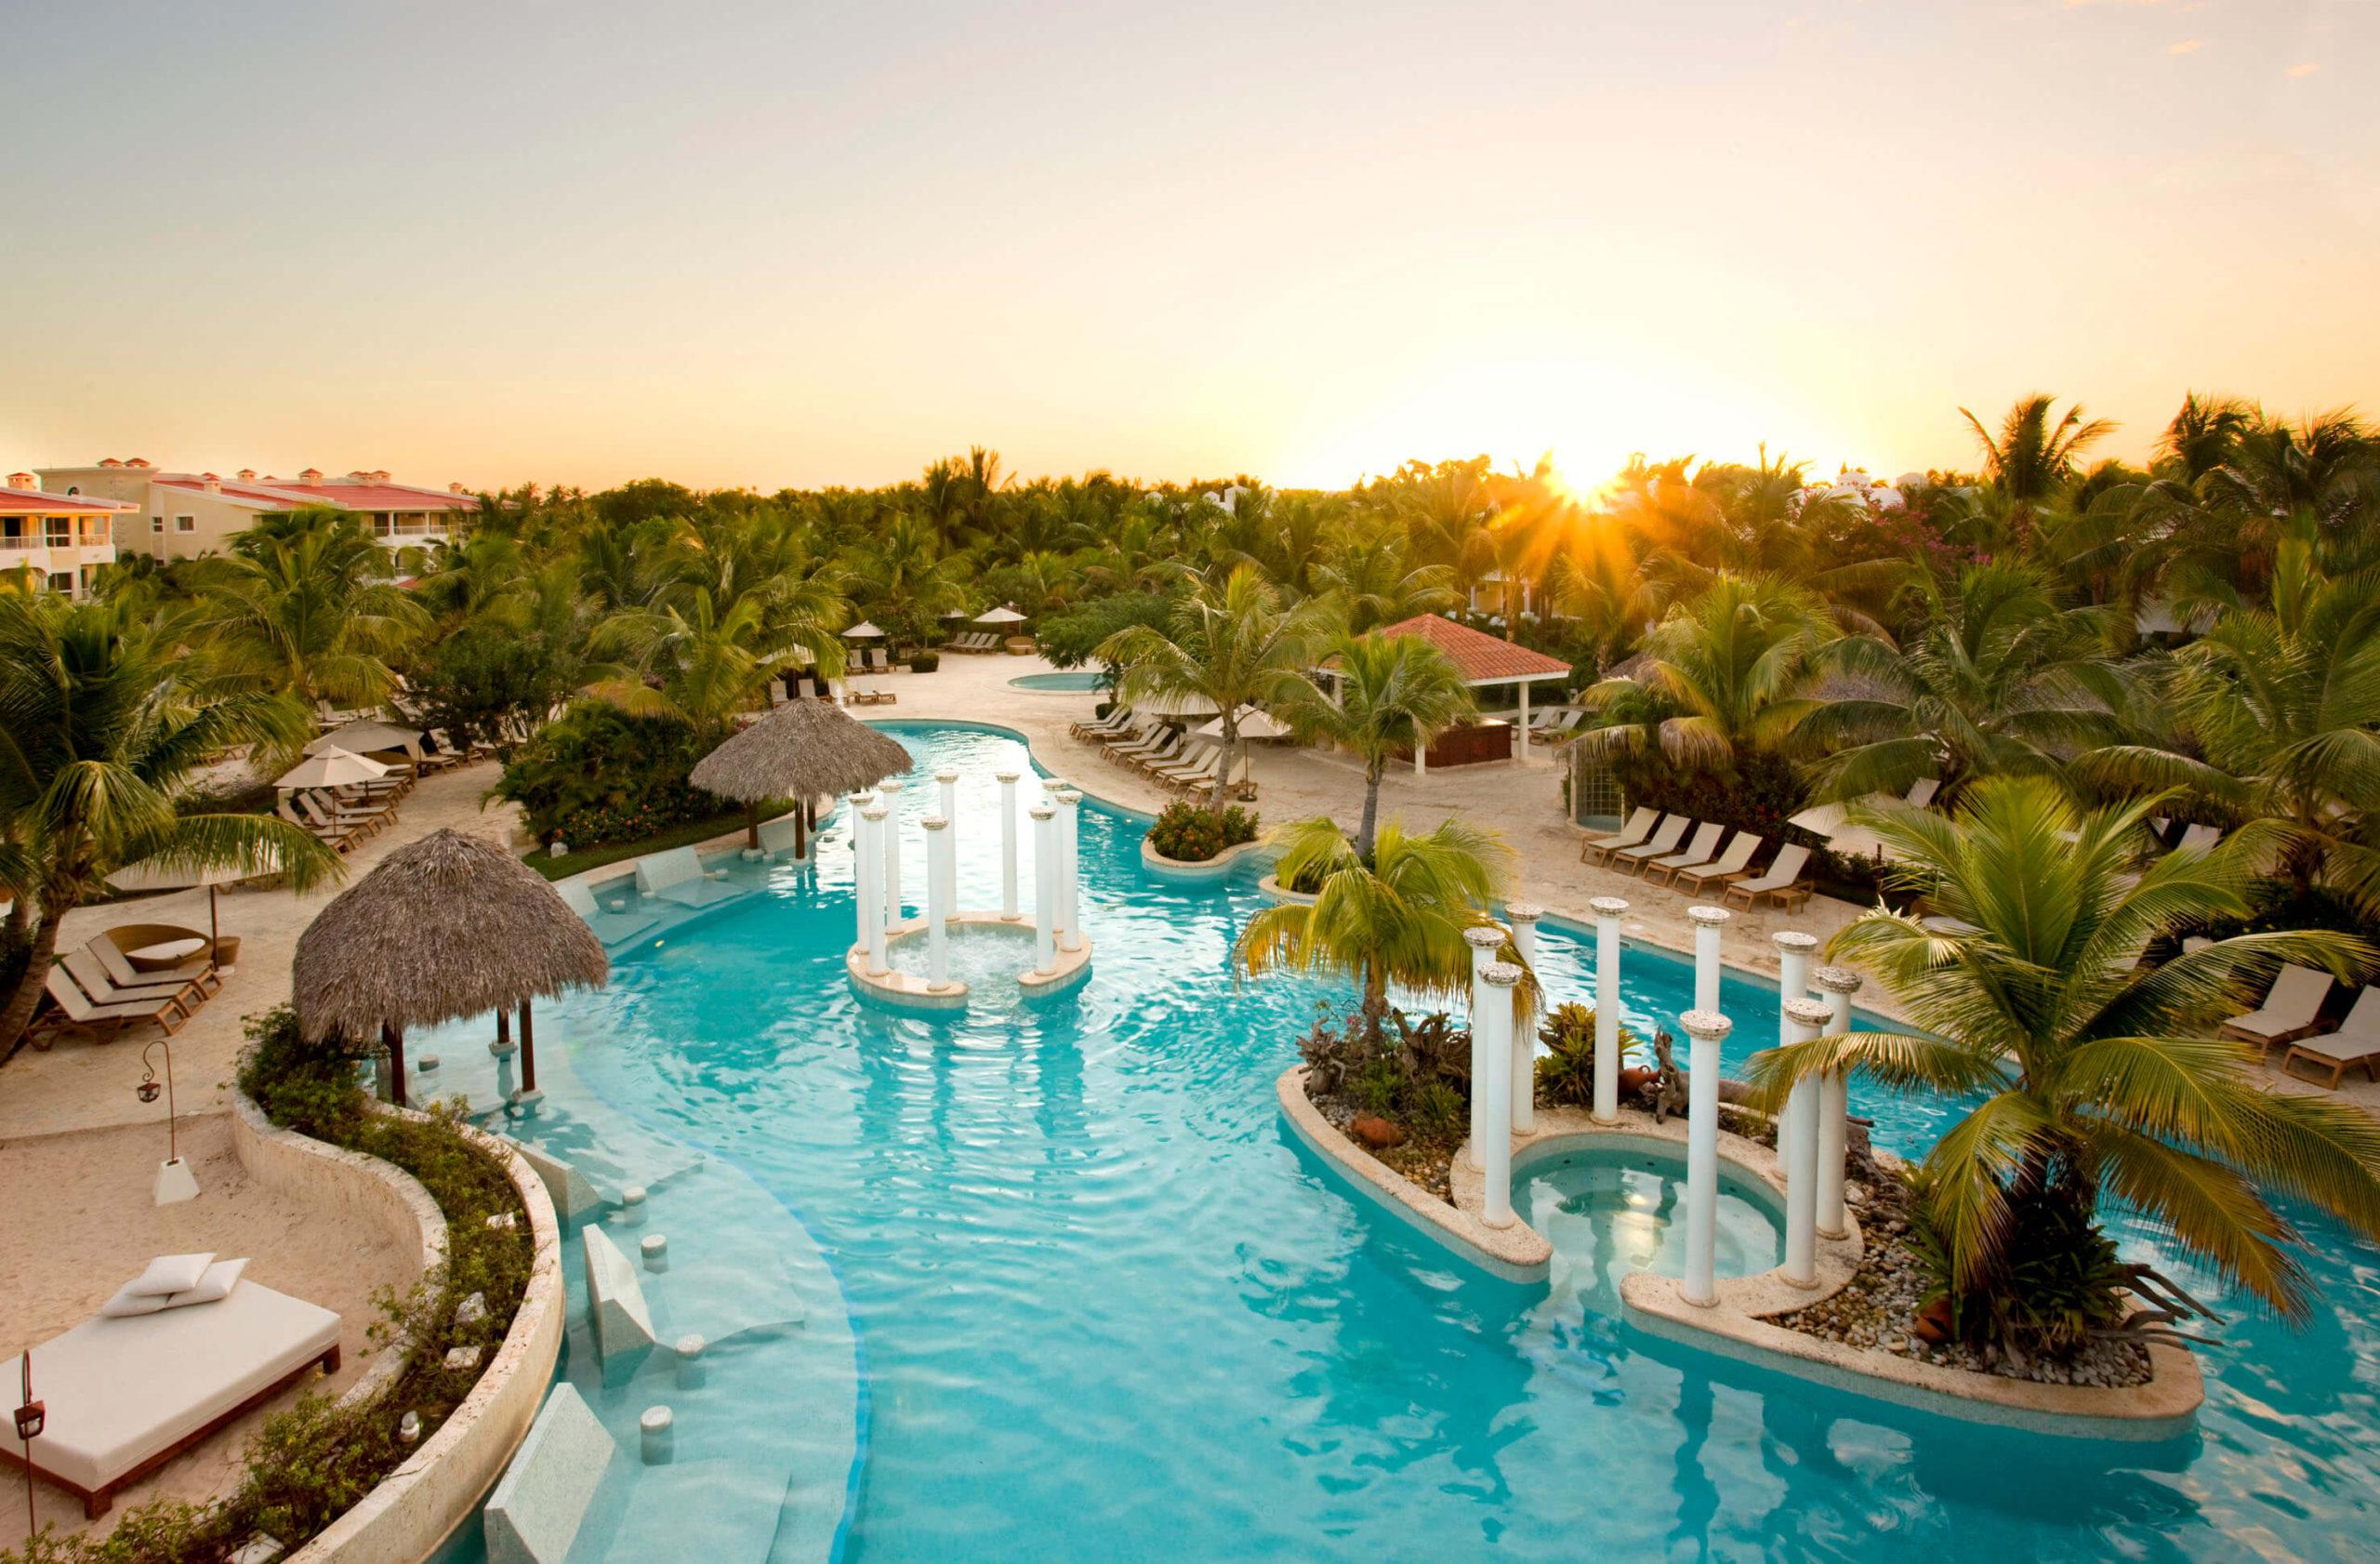 Meliá Punta Cana Beach Resort & Meliá Caribe Beach Resort Officially Open